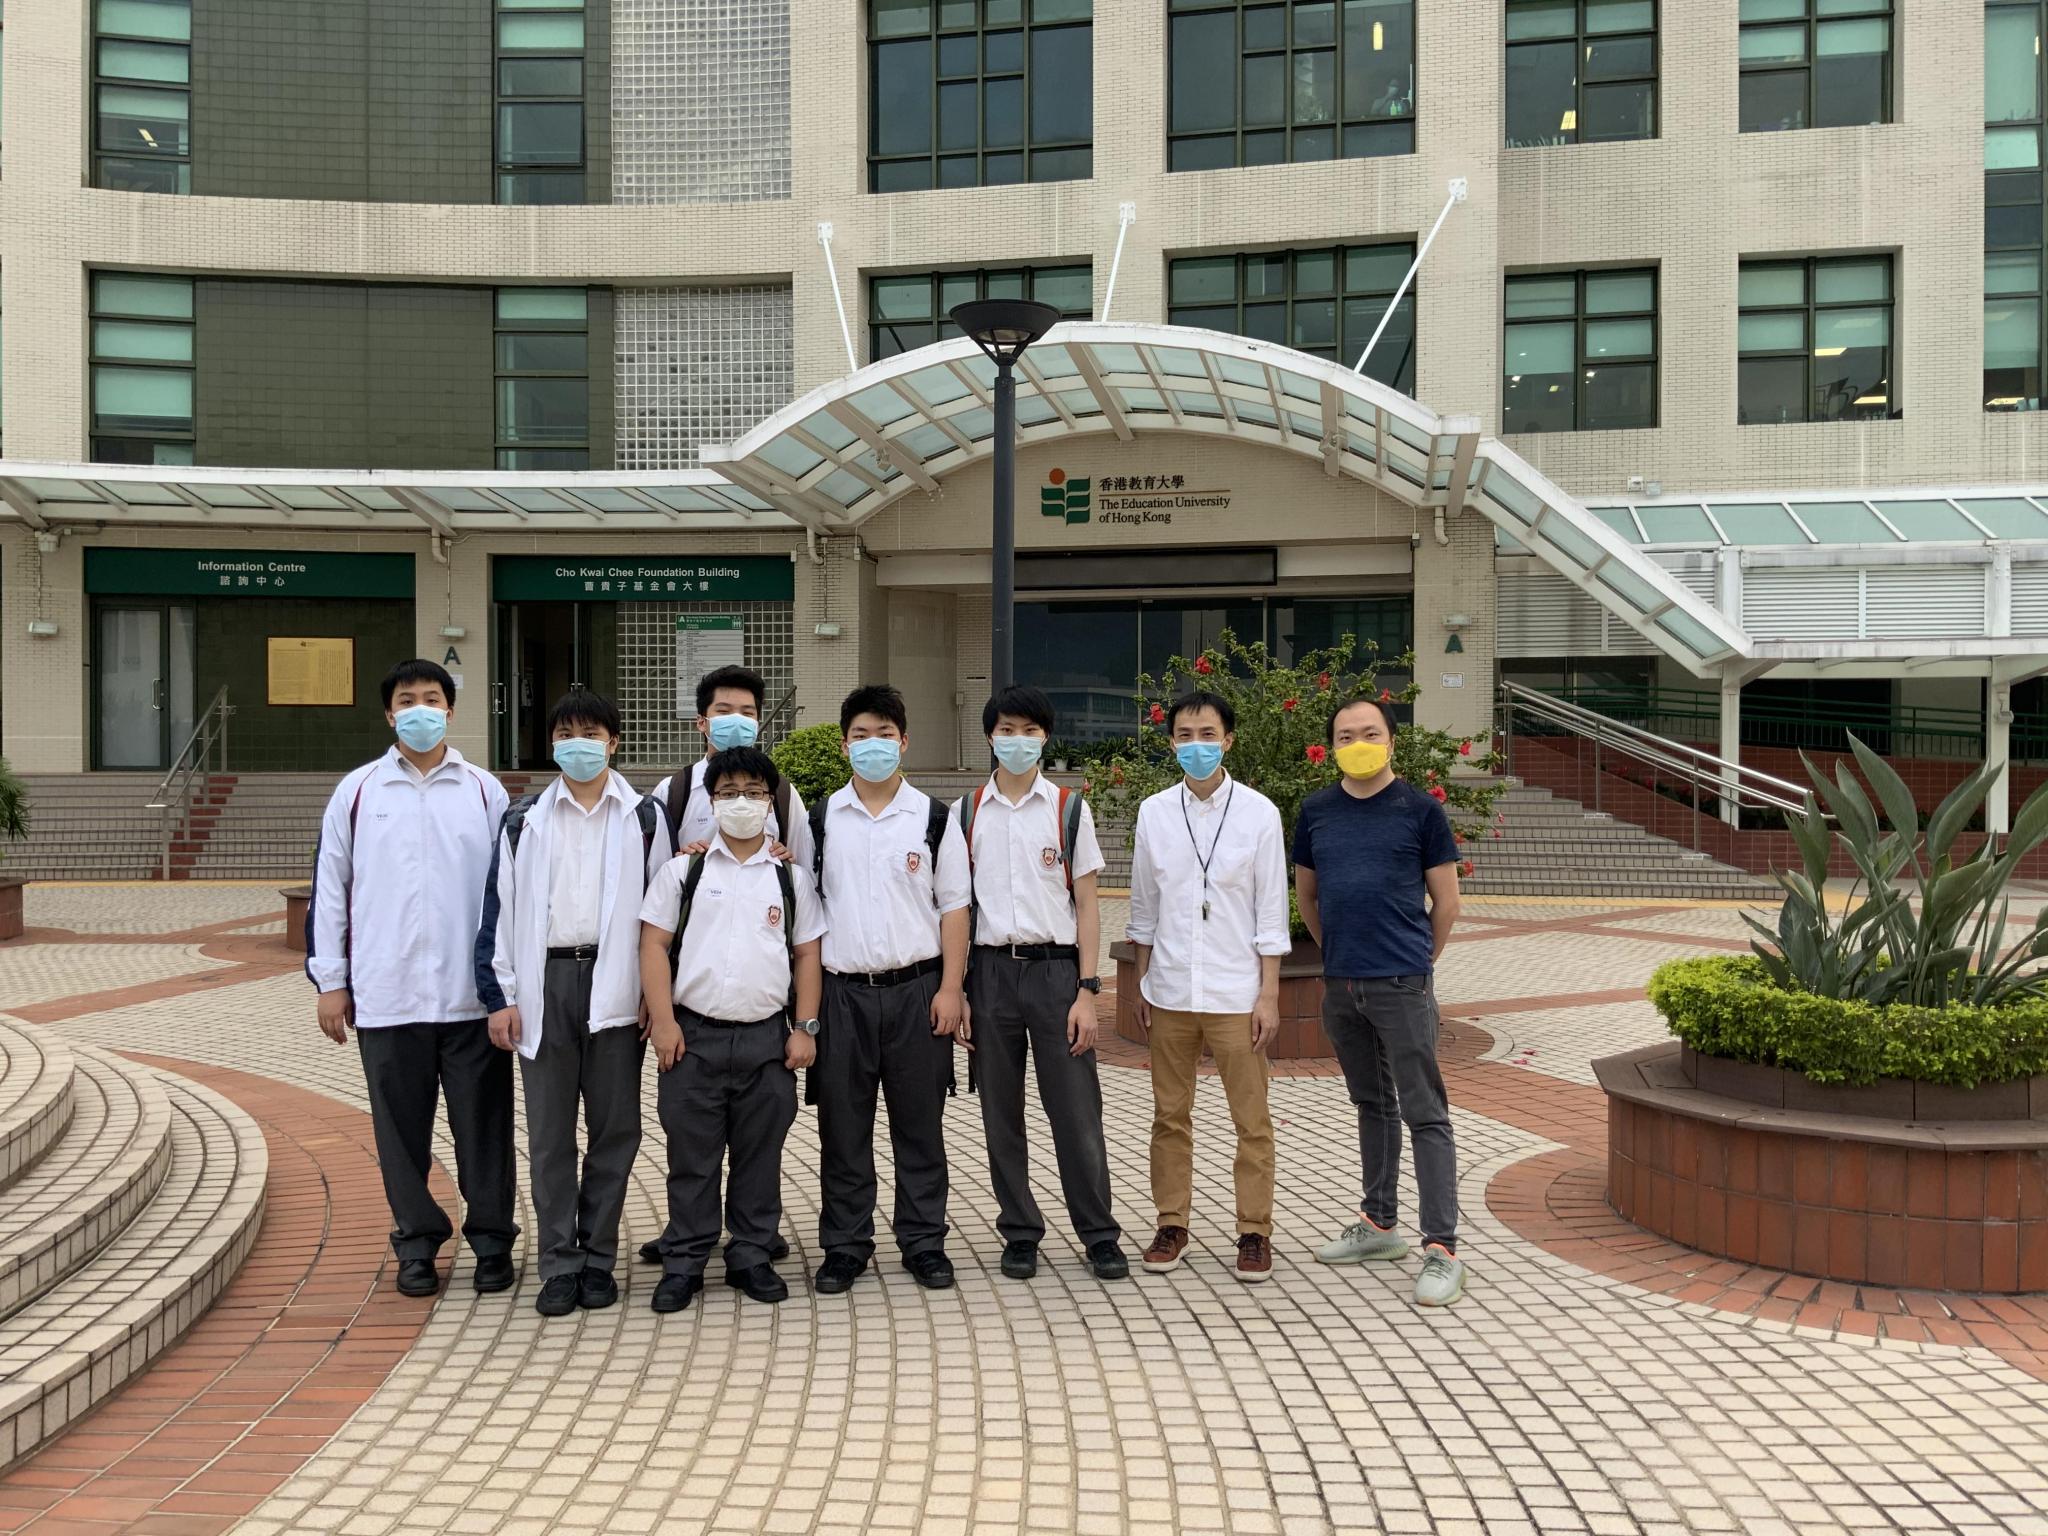 S.3 students visited the Education University of Hong Kong on 10 November 2020.